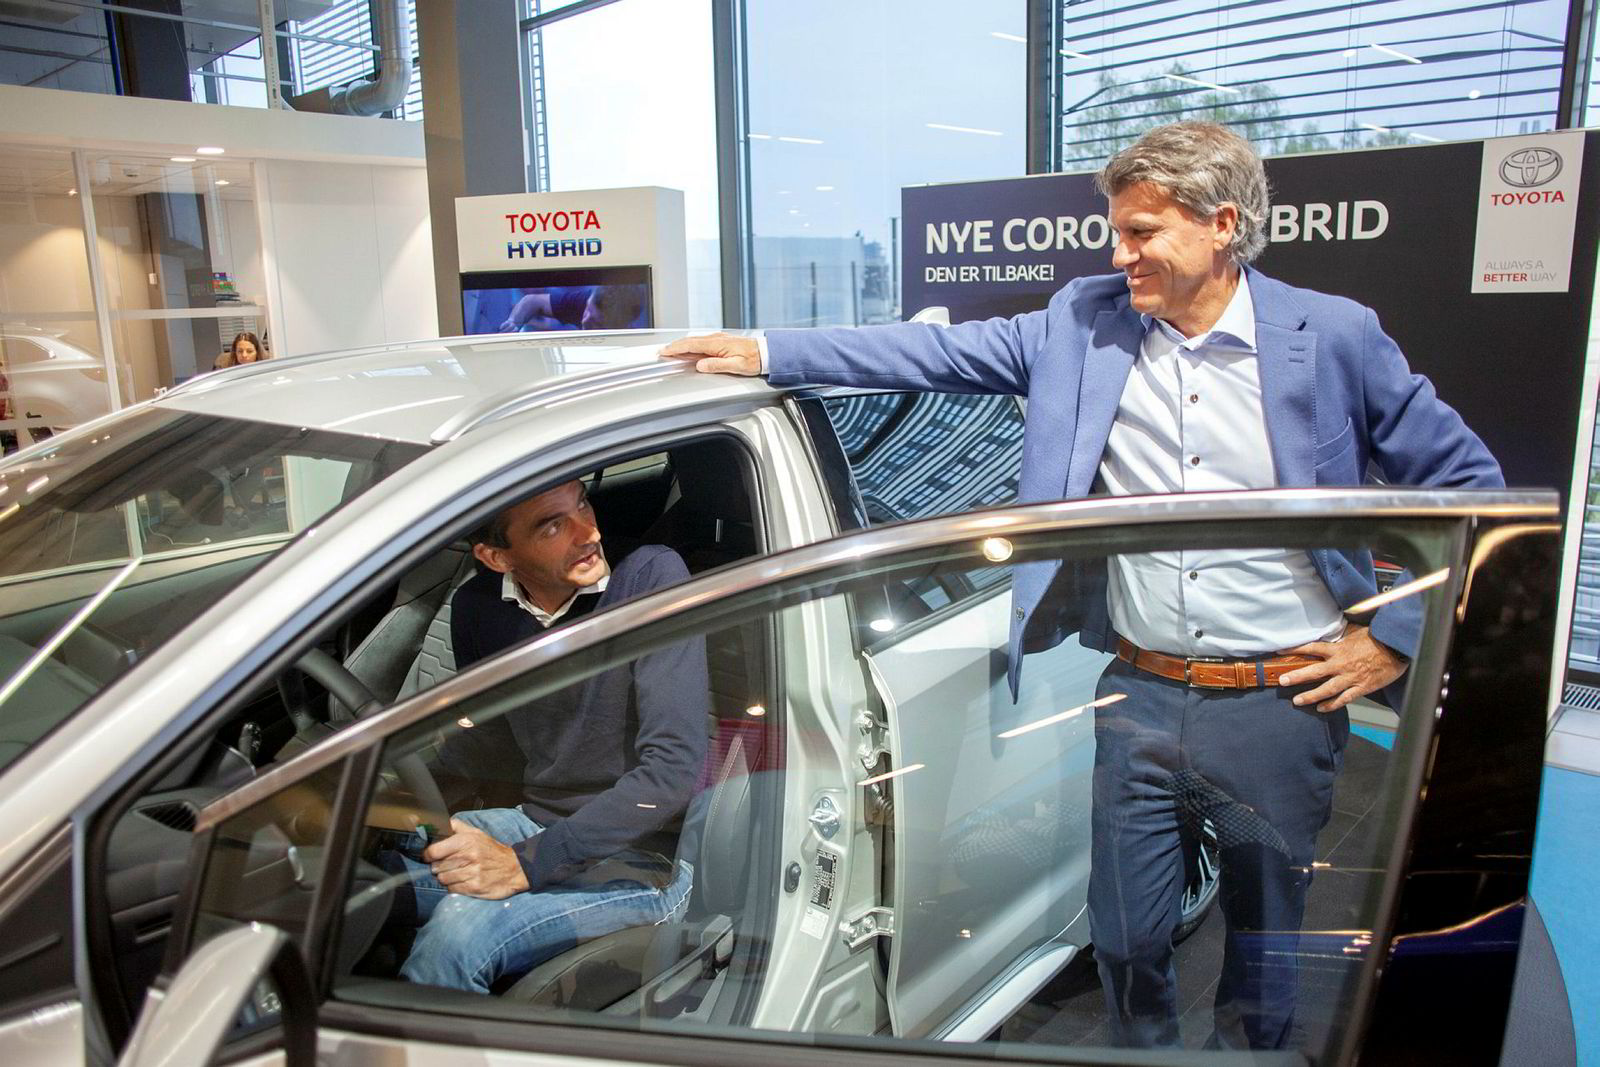 Ifølge Baumann og Guthus har Bauda aldri solgt flere biler enn hittil i år, med 2570 kontrakter i første kvartal. I fjor solgte konsernet 6609 Toyota og 412 nye Lexus.